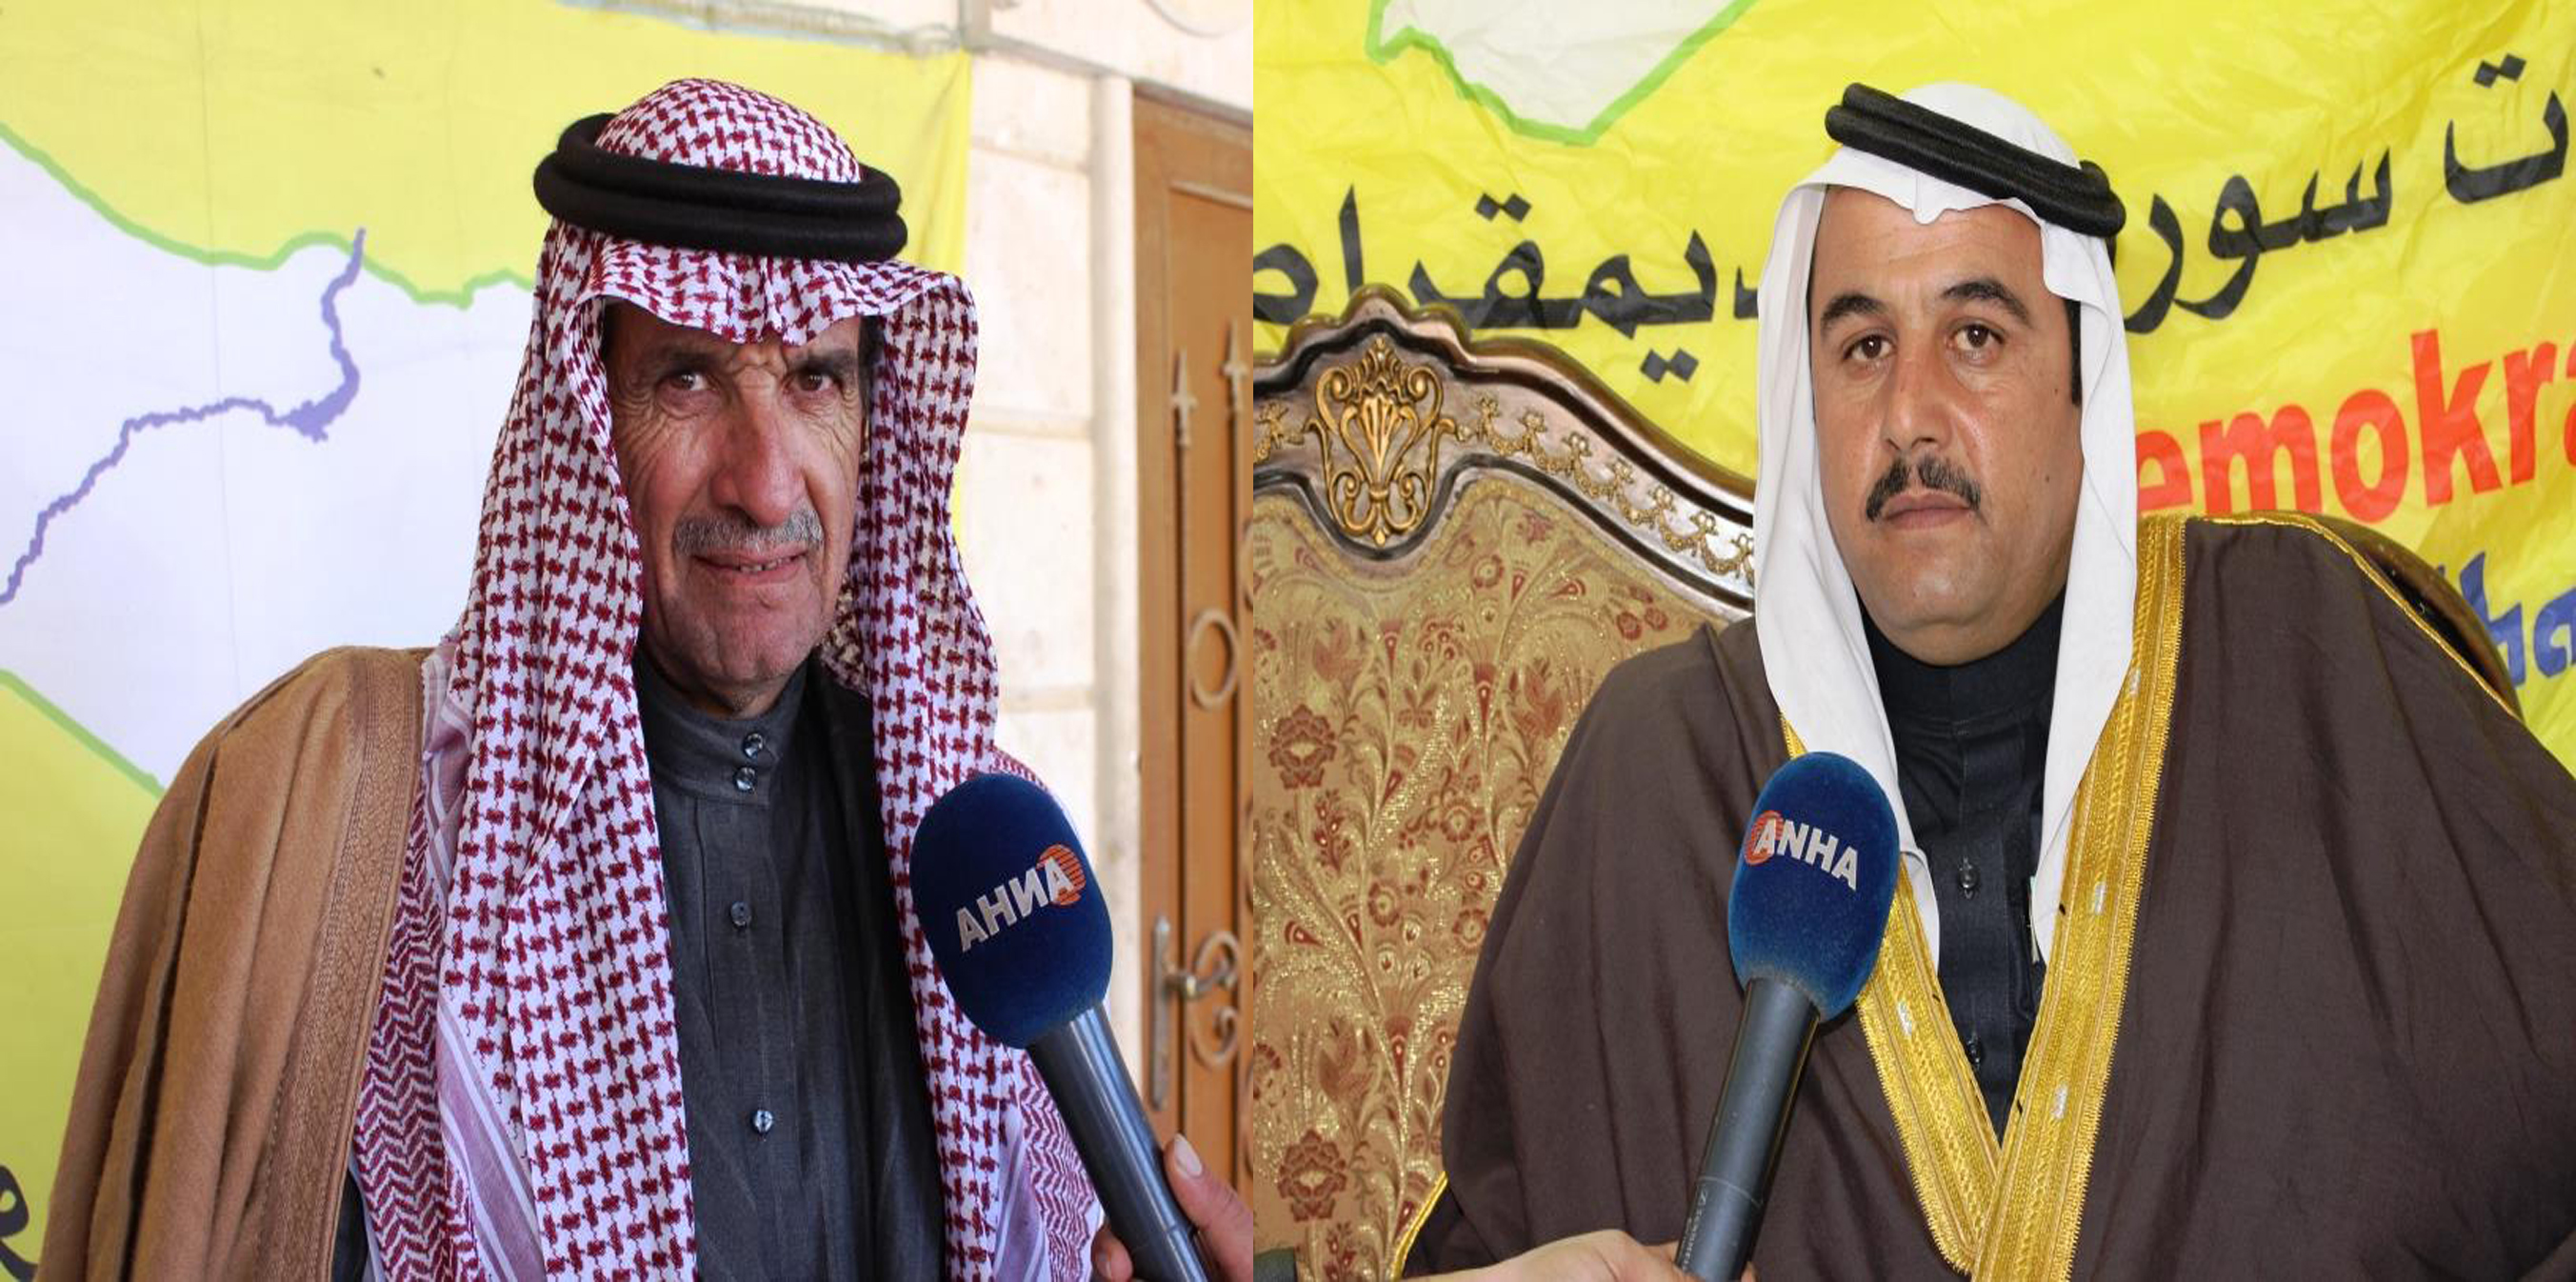 Al-Raqqa notables: We to repel any attack, regime must take decisive attitude